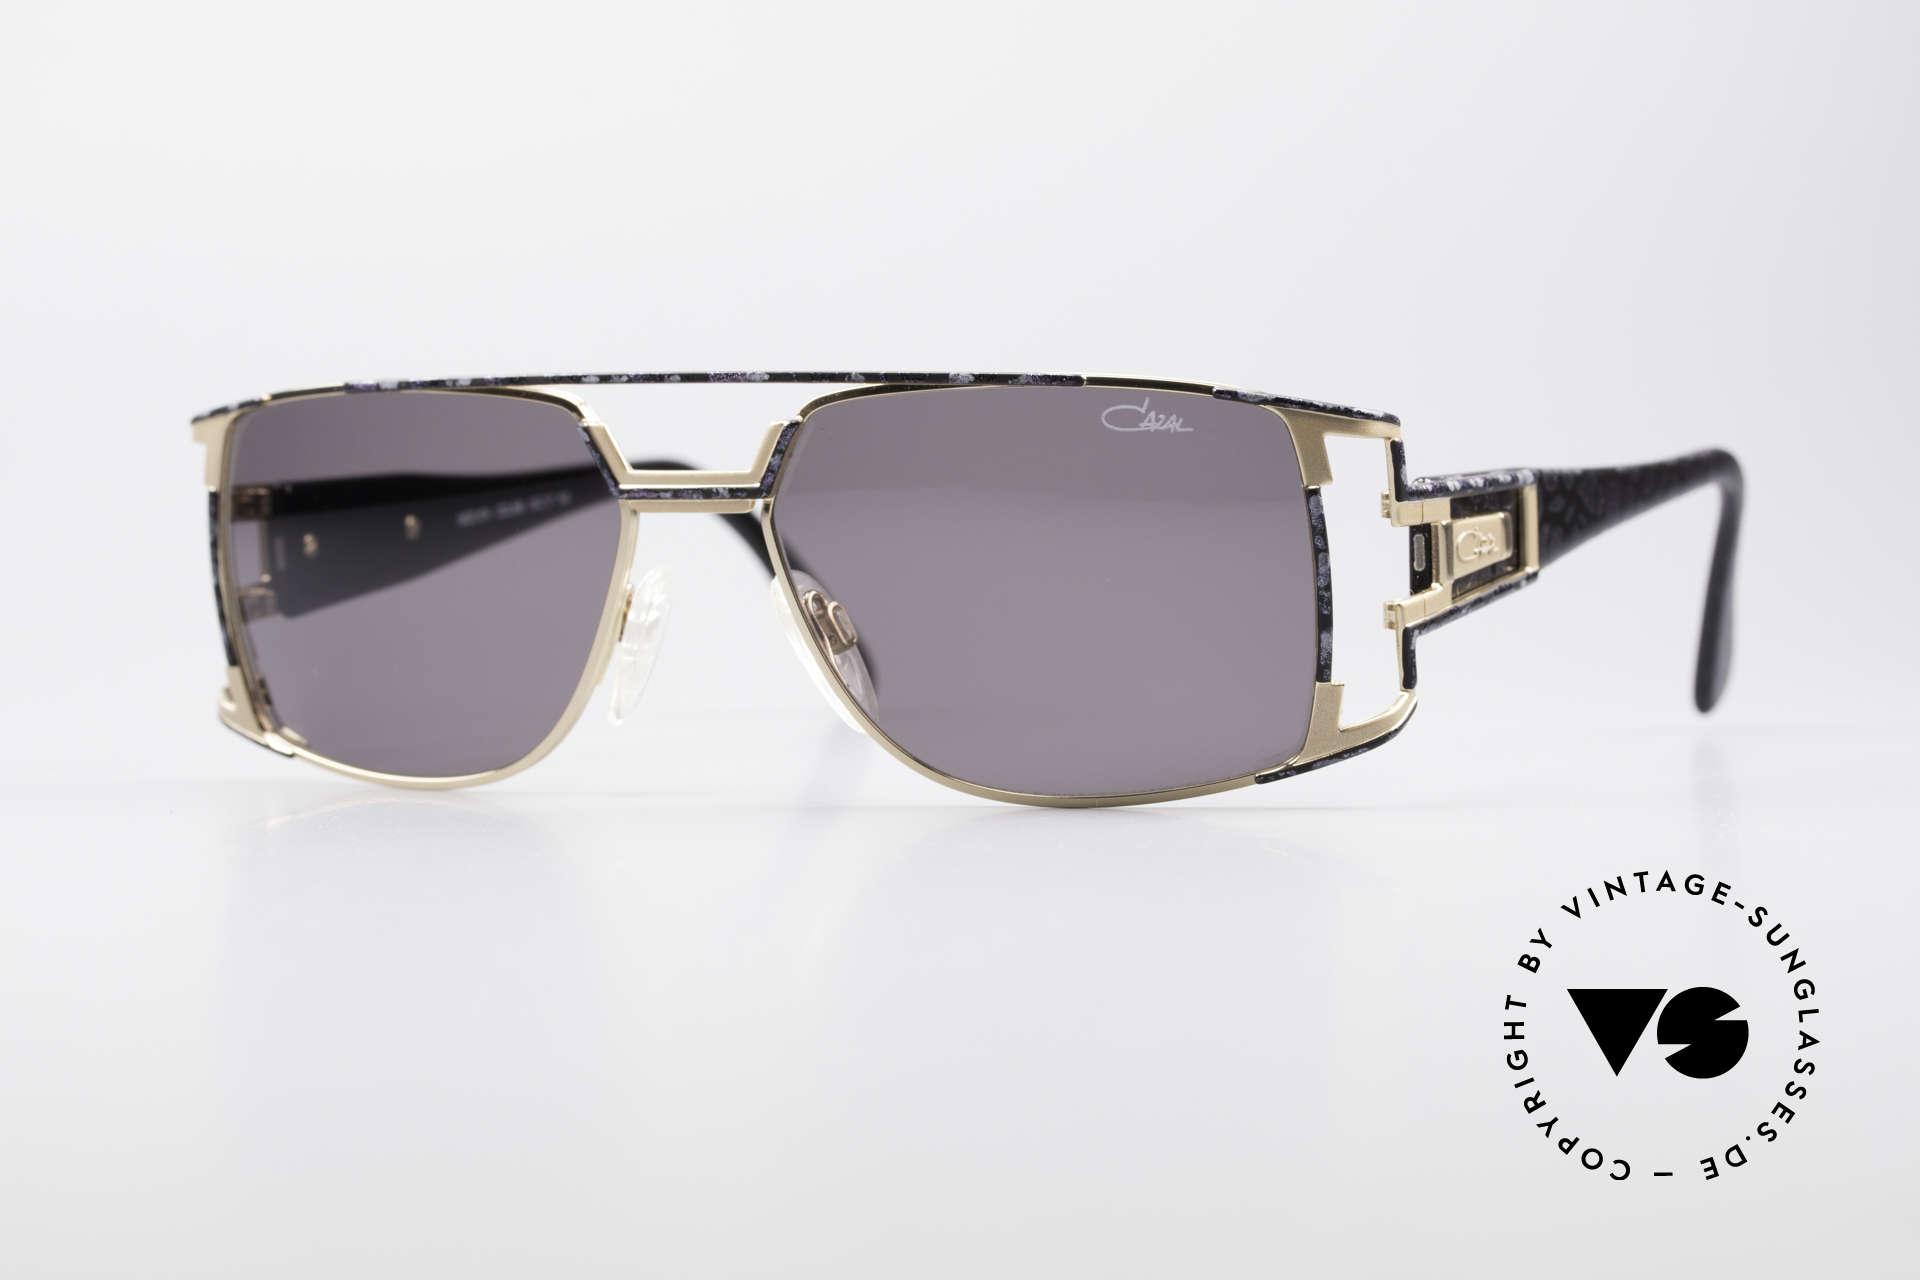 Cazal 974 Unisex Shades Ladies Men, vintage CAZAL unisex designer sunglasses from 1997, Made for Men and Women